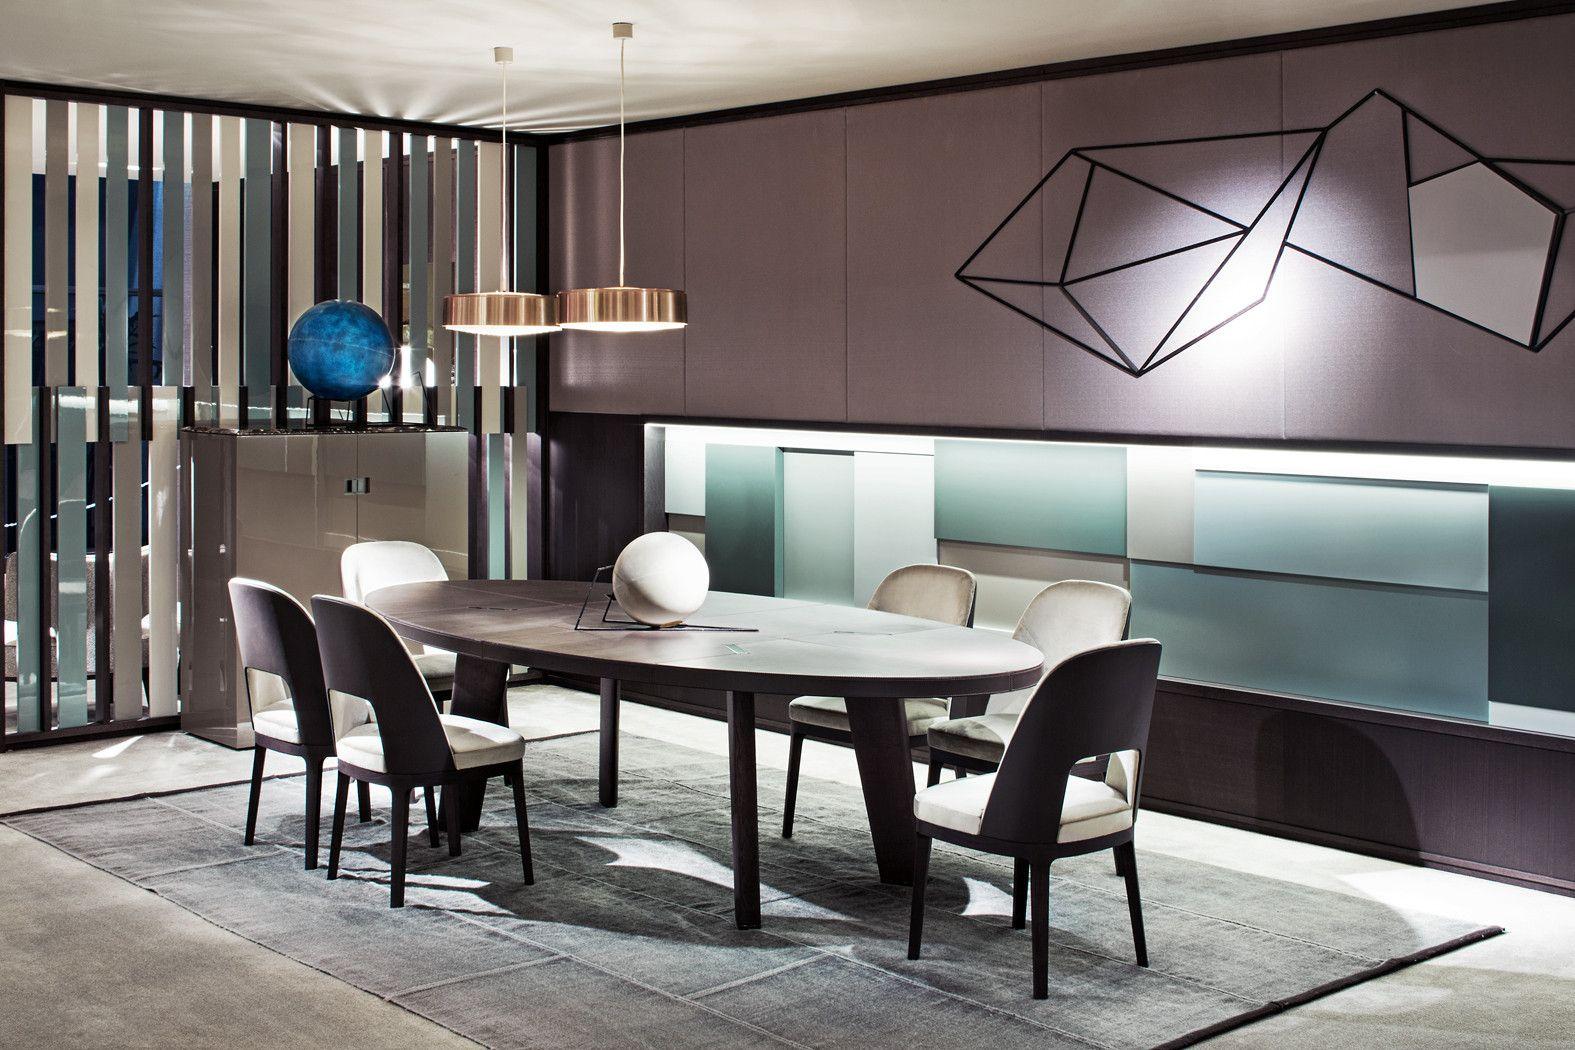 Kitchen Chairs London Ontario